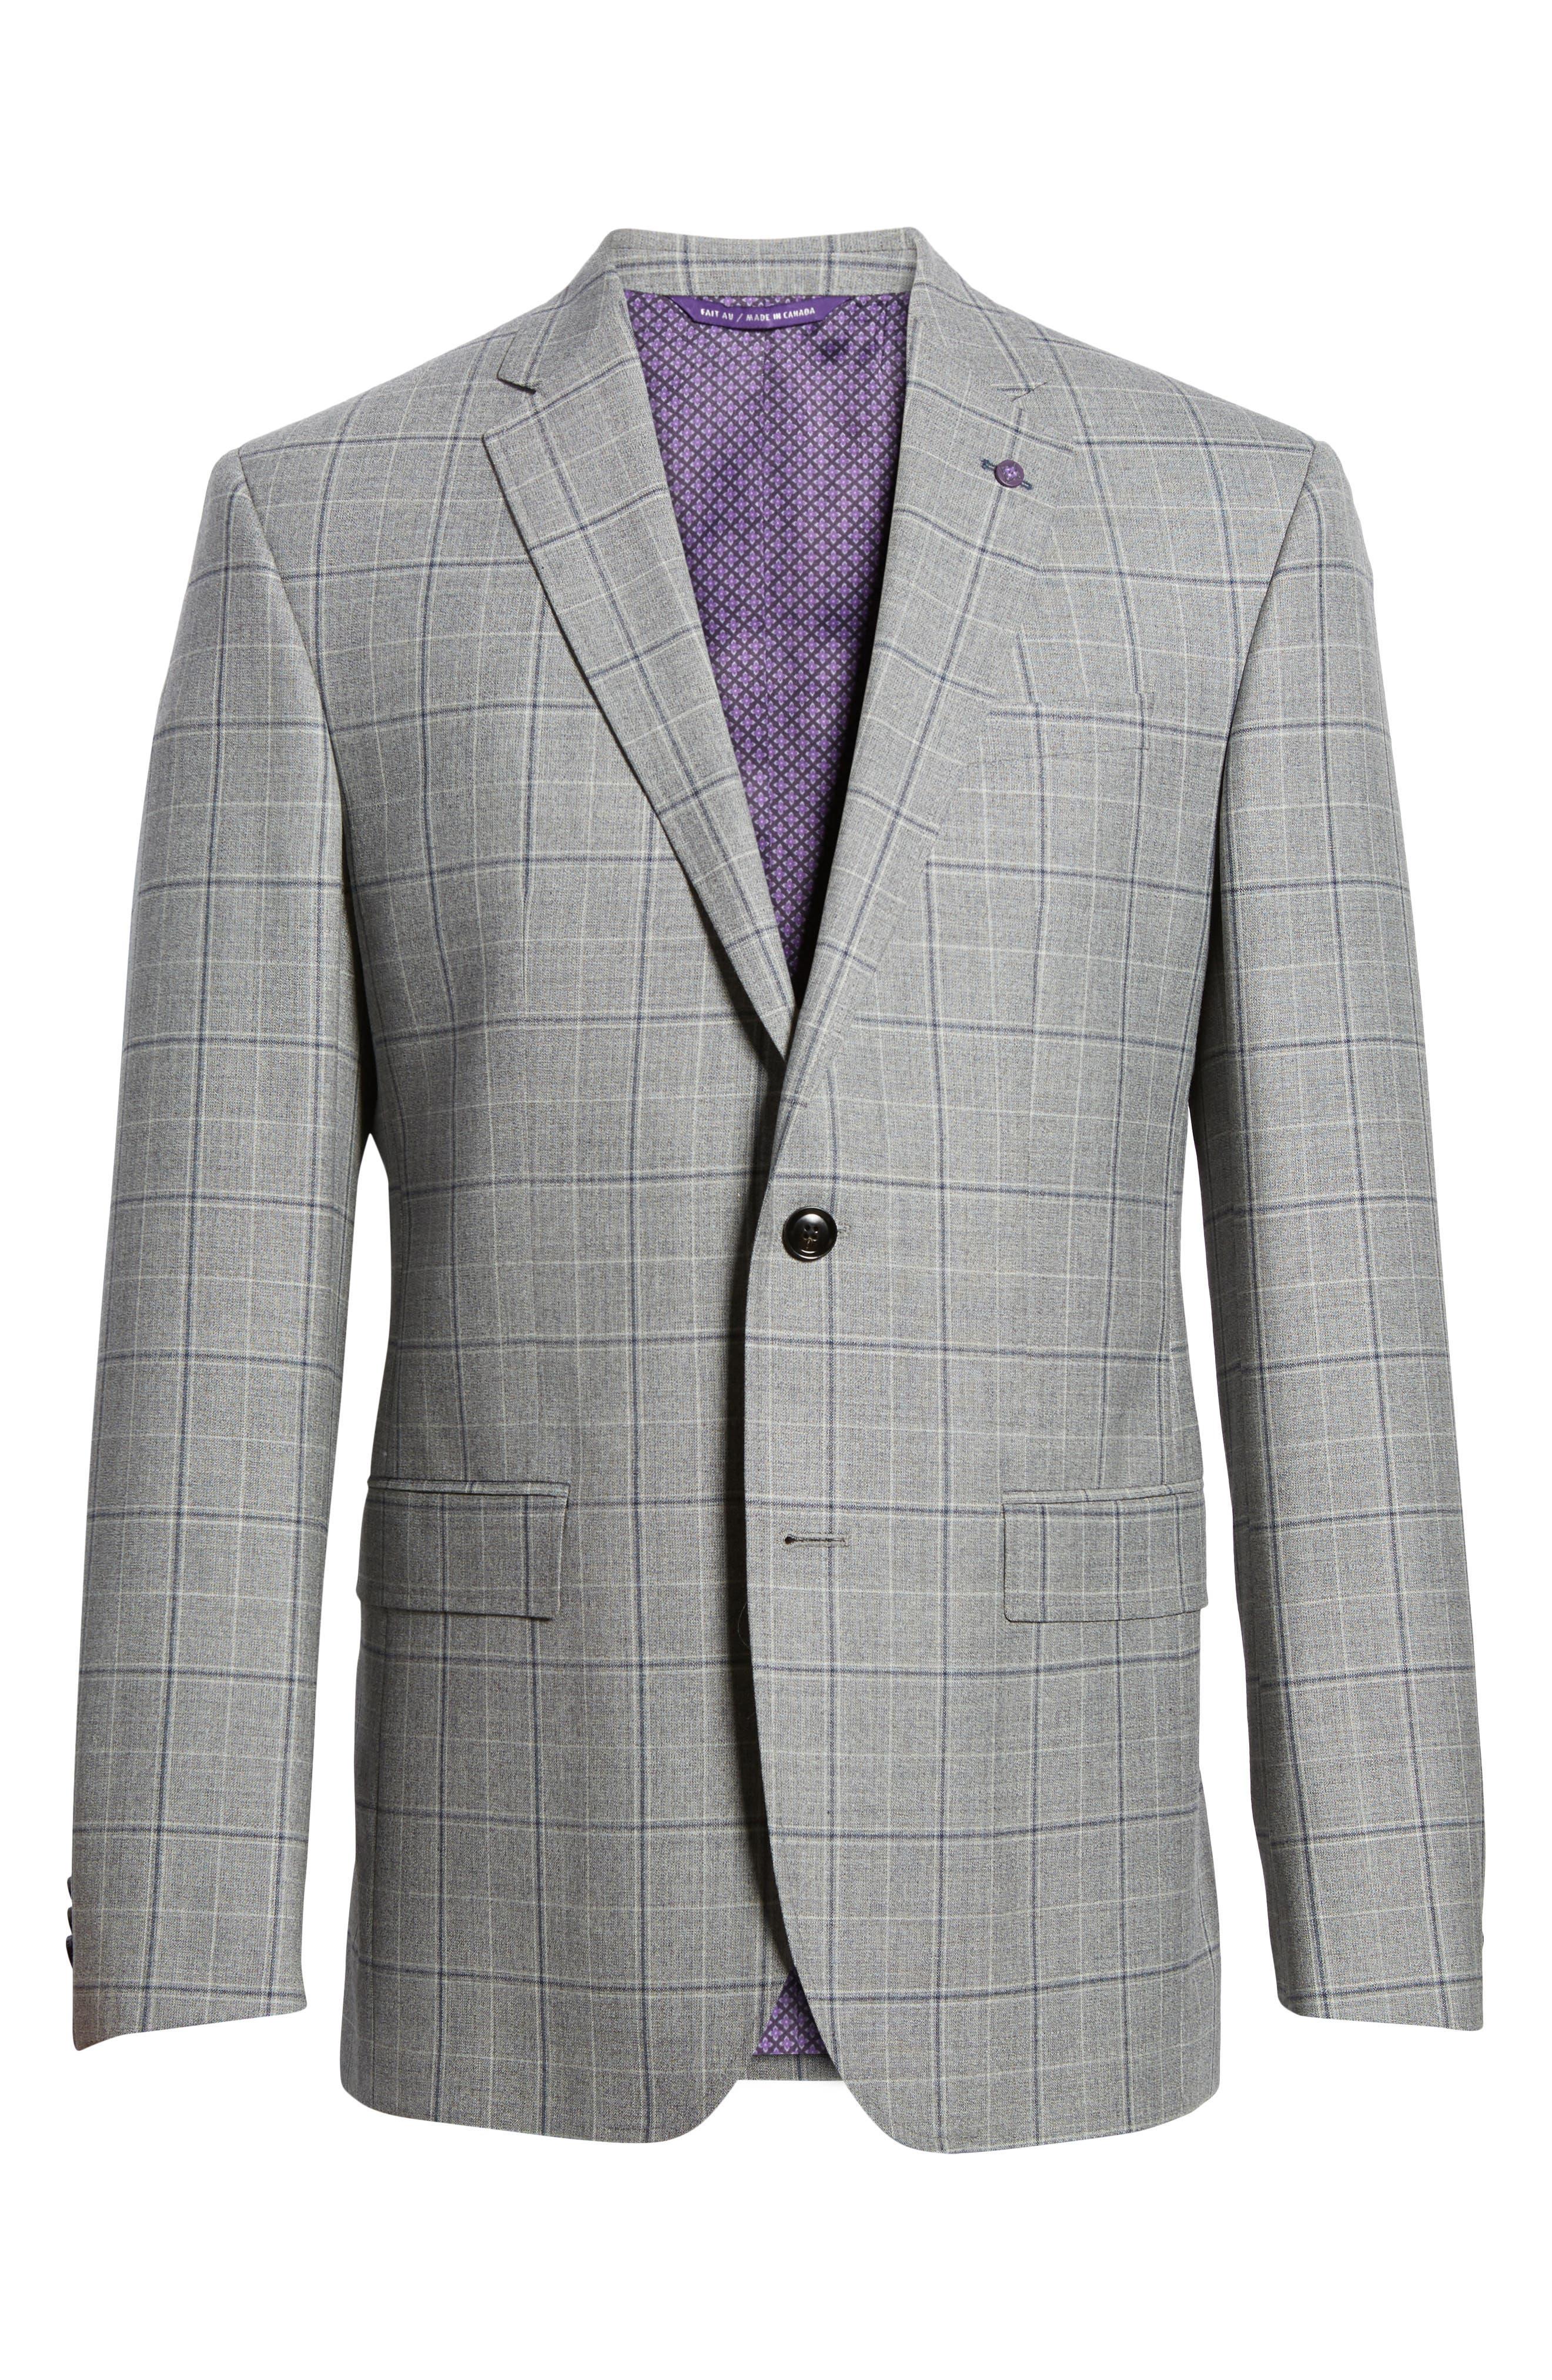 Jay Trim Fit Plaid Wool Sport Coat,                             Alternate thumbnail 6, color,                             Light Grey